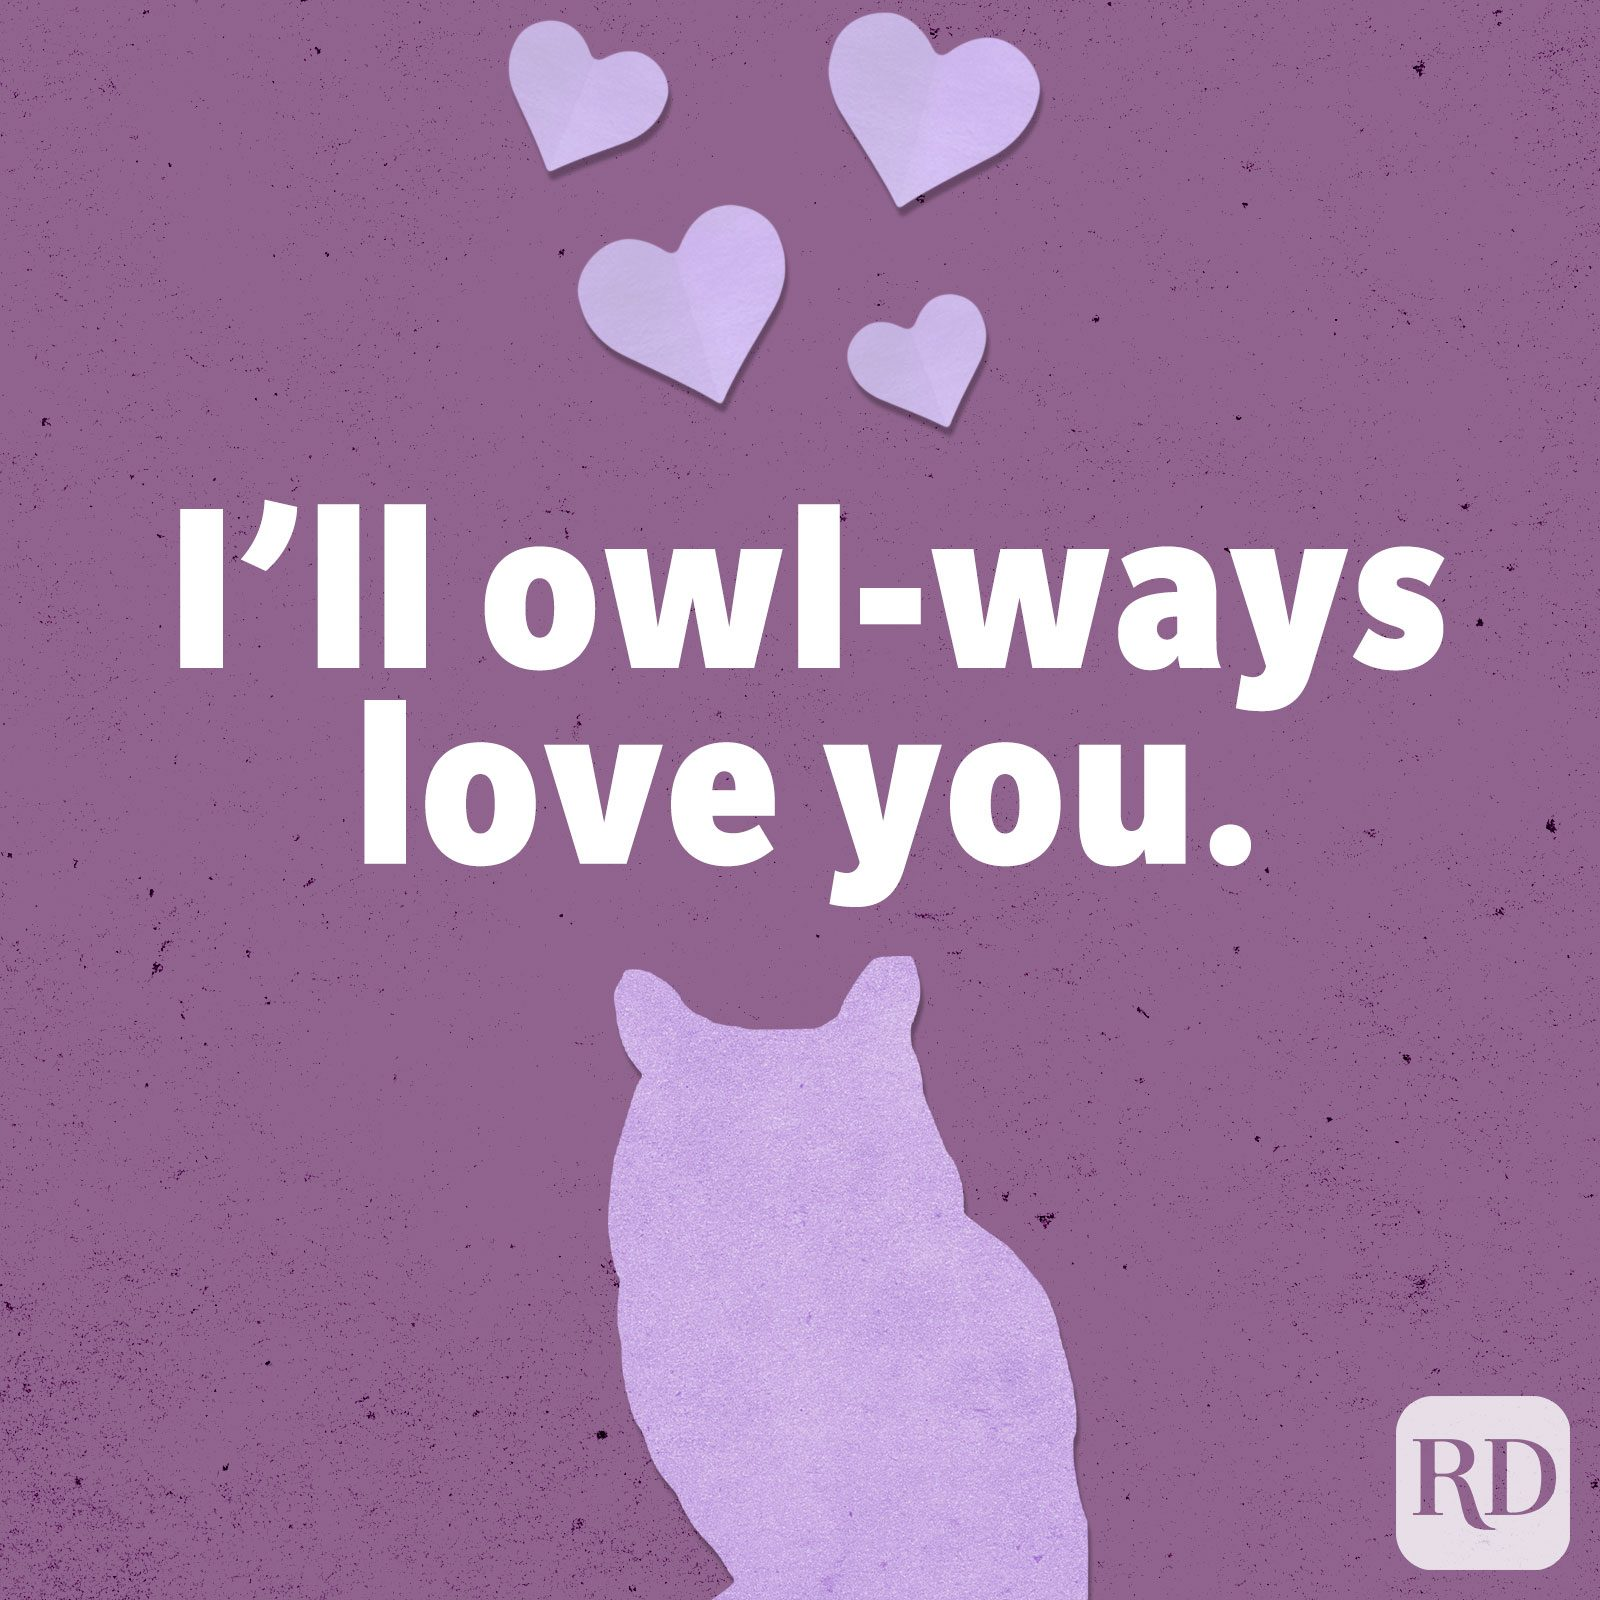 I'll owl-ways love you.